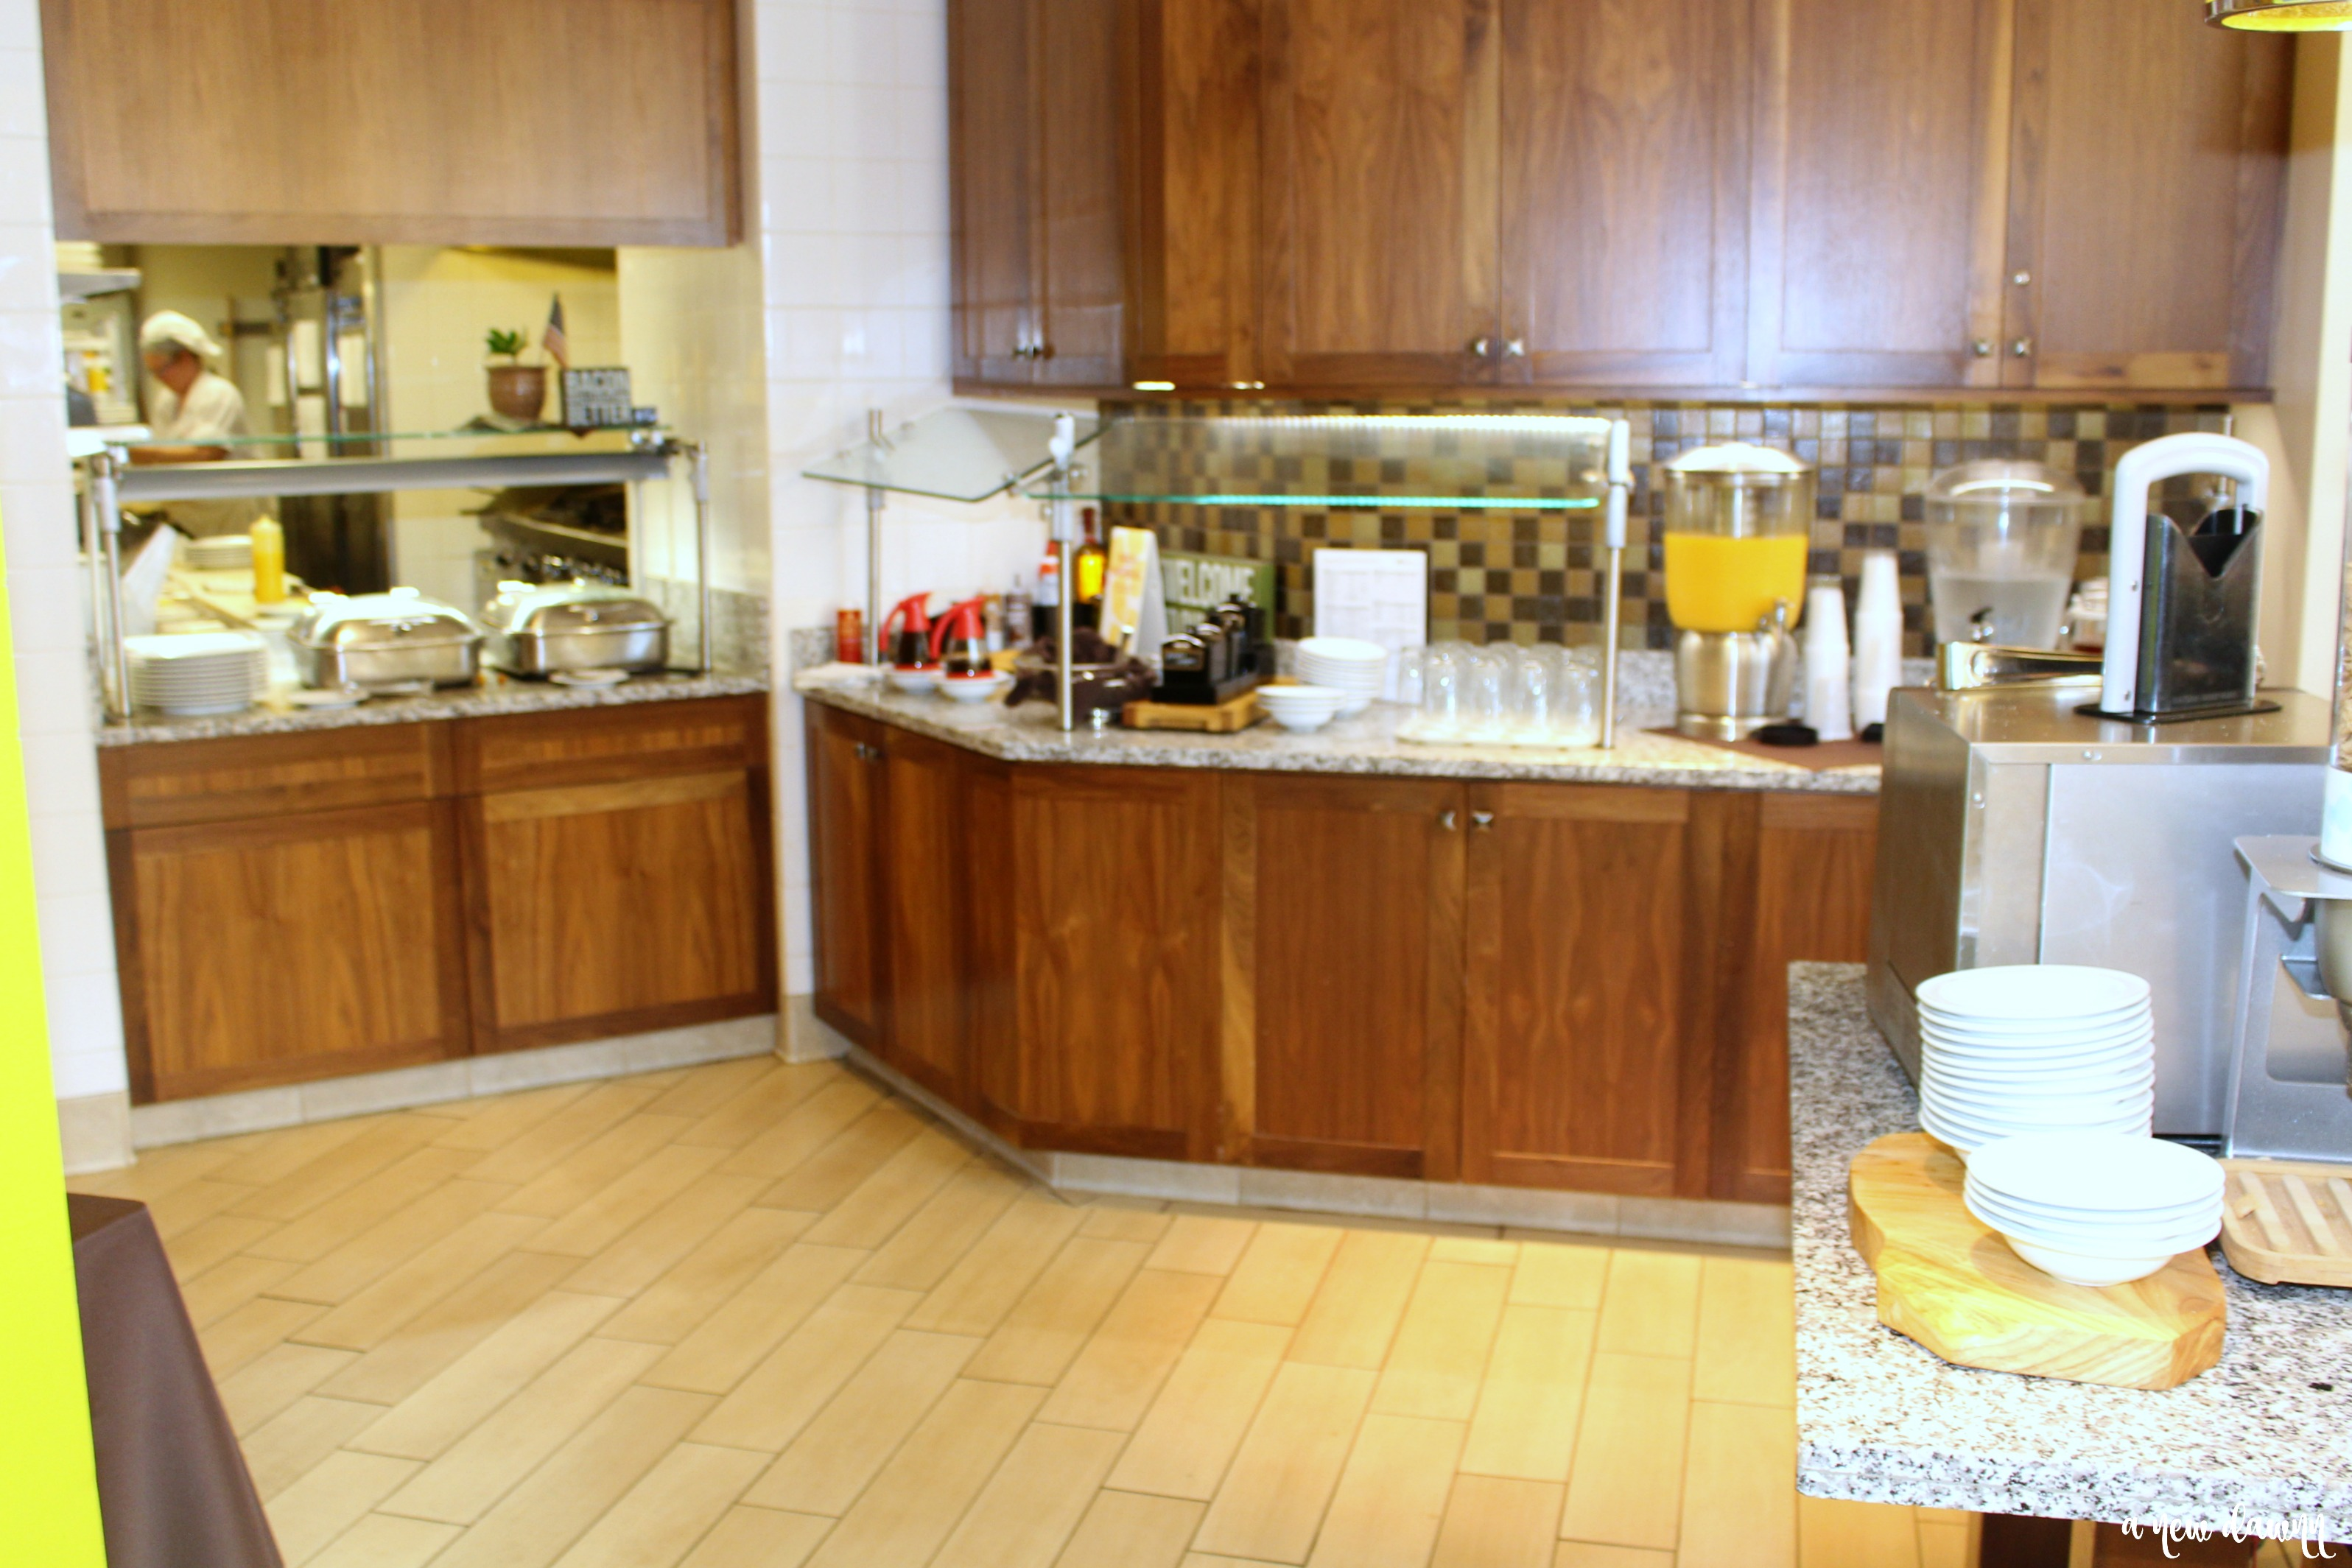 Breakfast buffet area at the Hilton Garden Inn Hershey